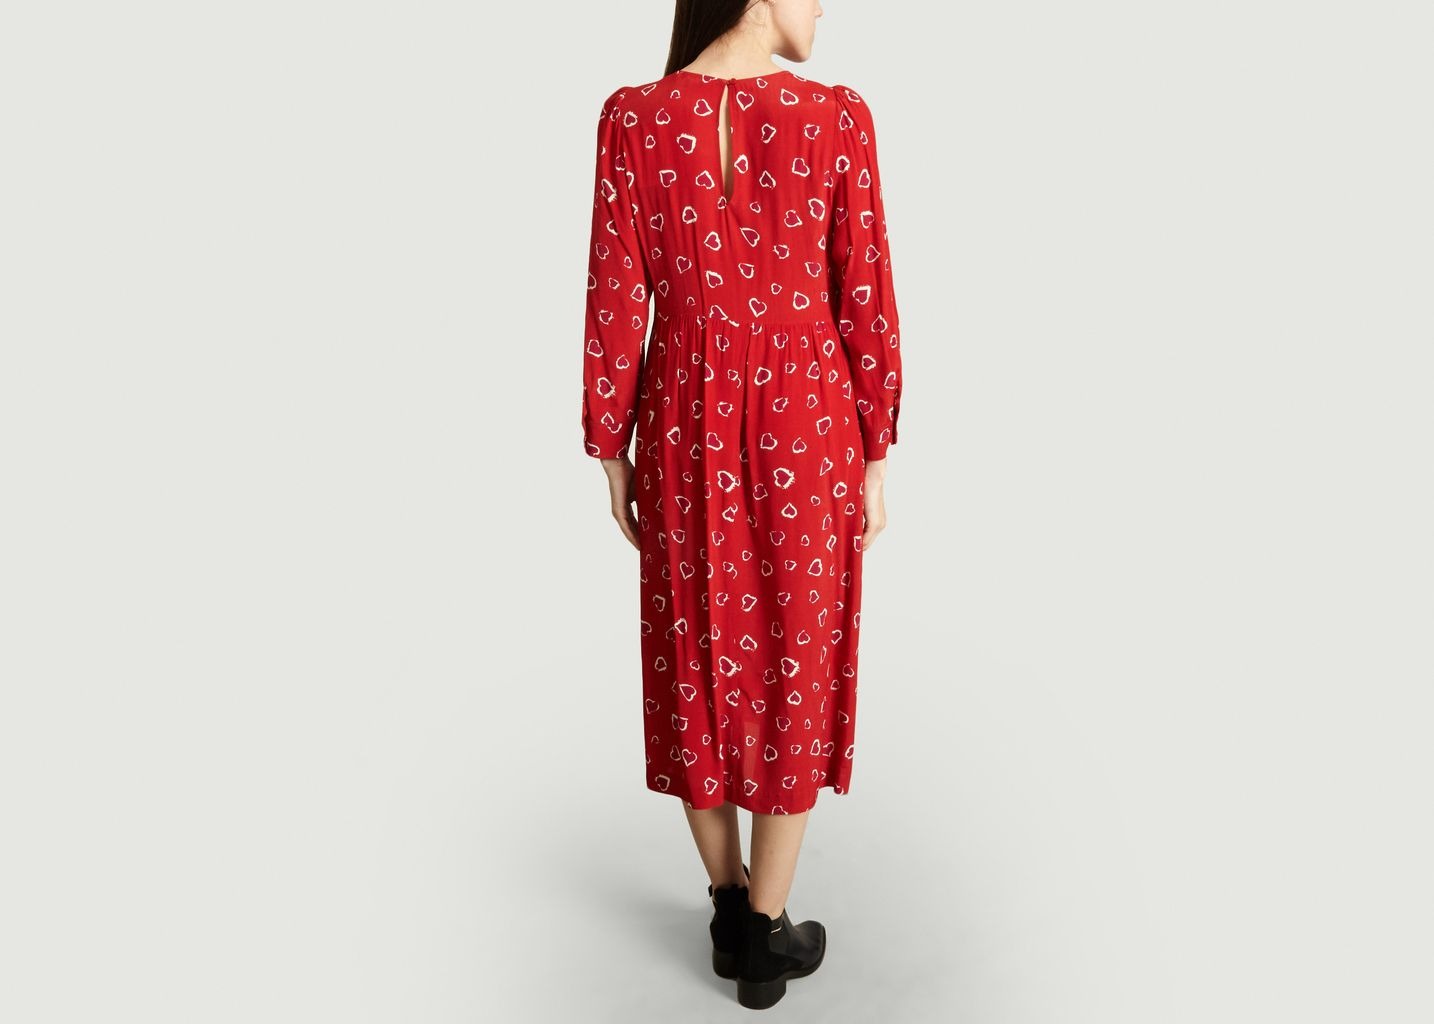 Robe Imprimée - Tara Jarmon